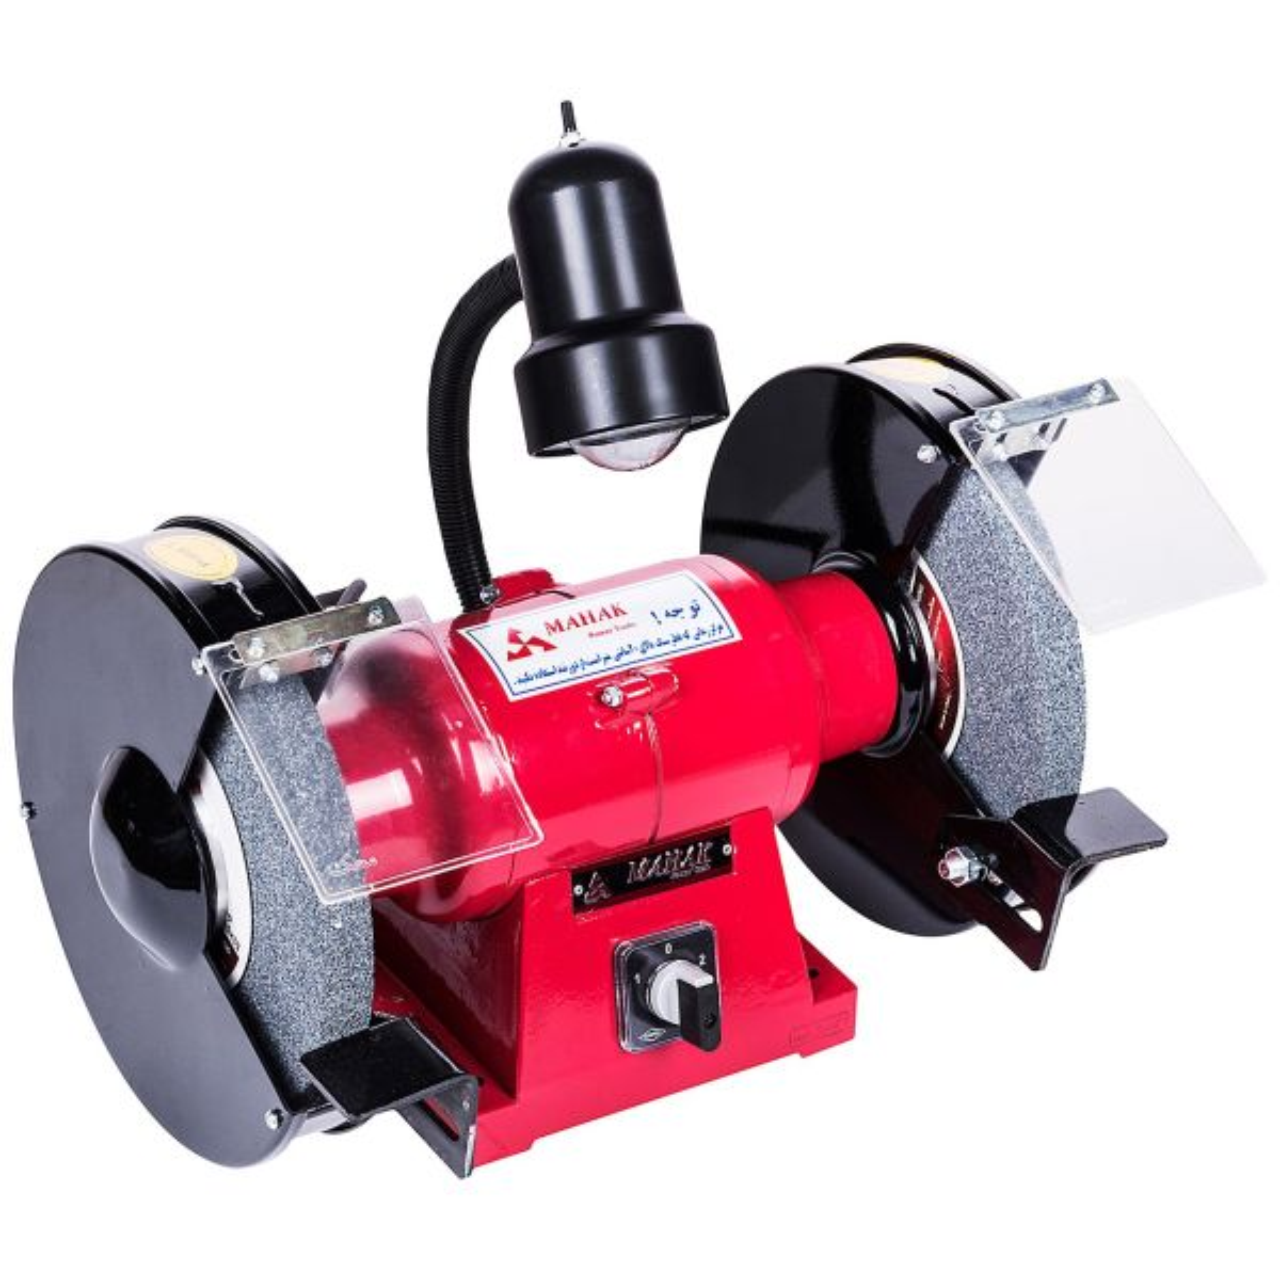 چرخ سنباده محک مدل GD200-1H